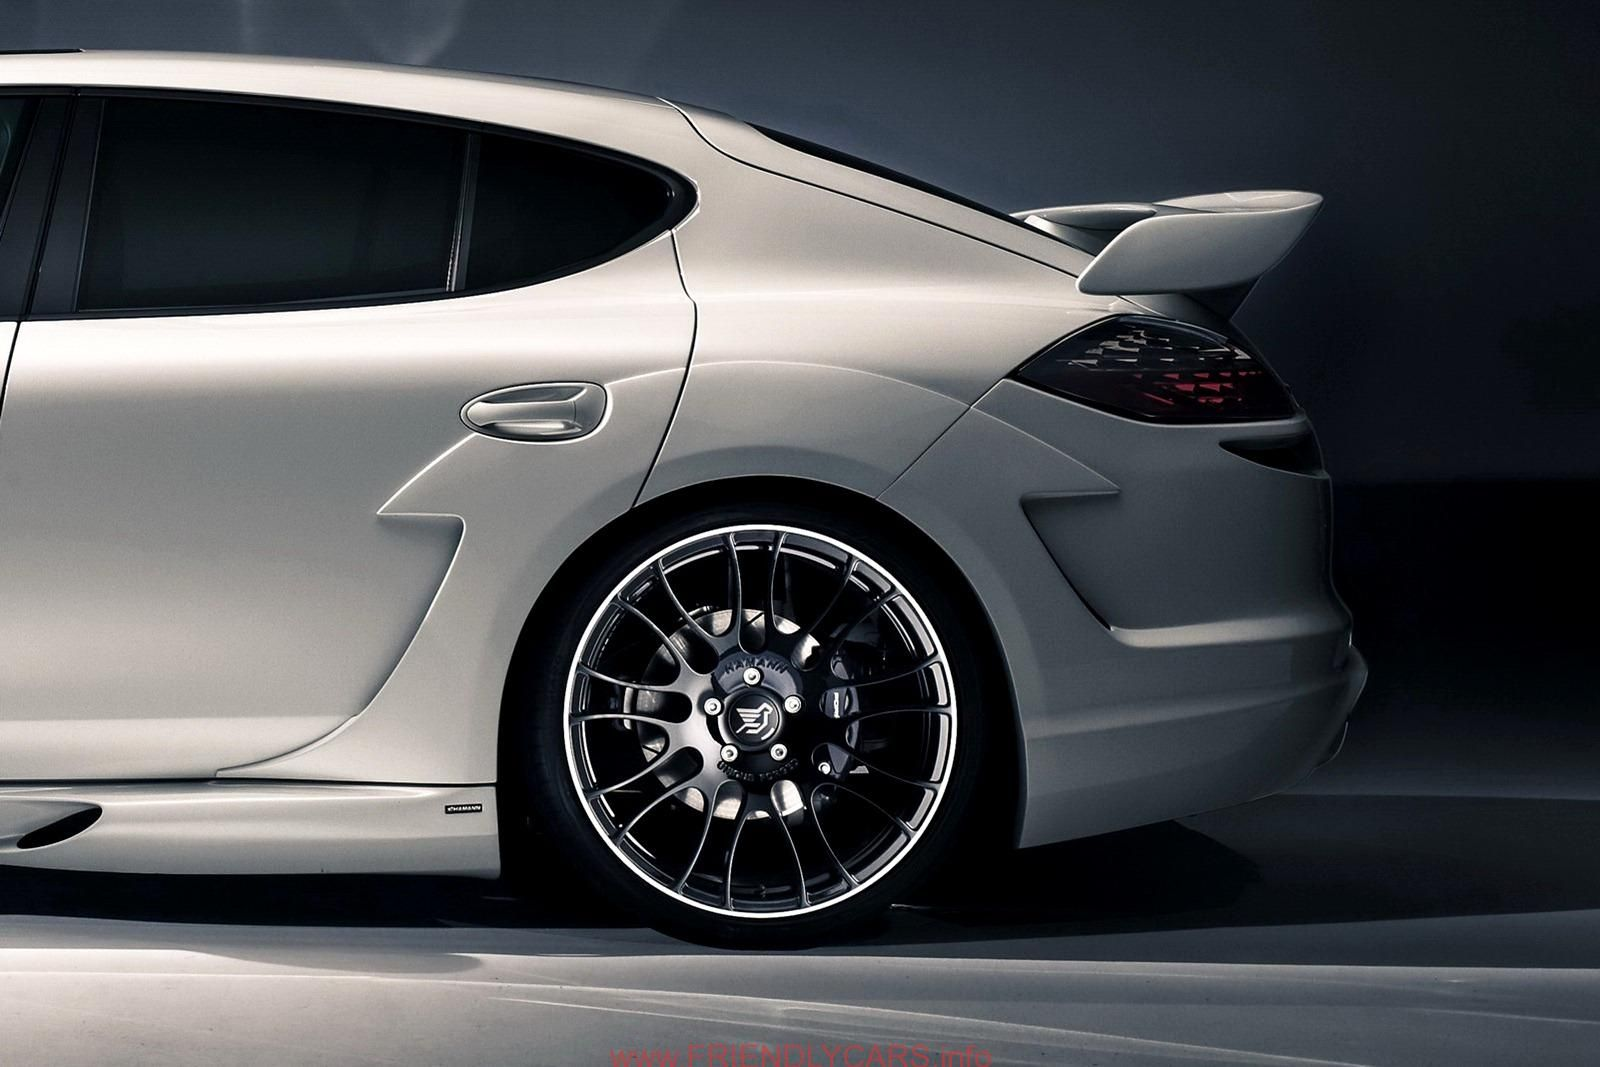 2014 porsche panamera interior car tuning - Awesome Porsche Panamera Turbo White Interior Car Images Hd Thekongblog Culture Entertainment Lifestyle Custom Porsche